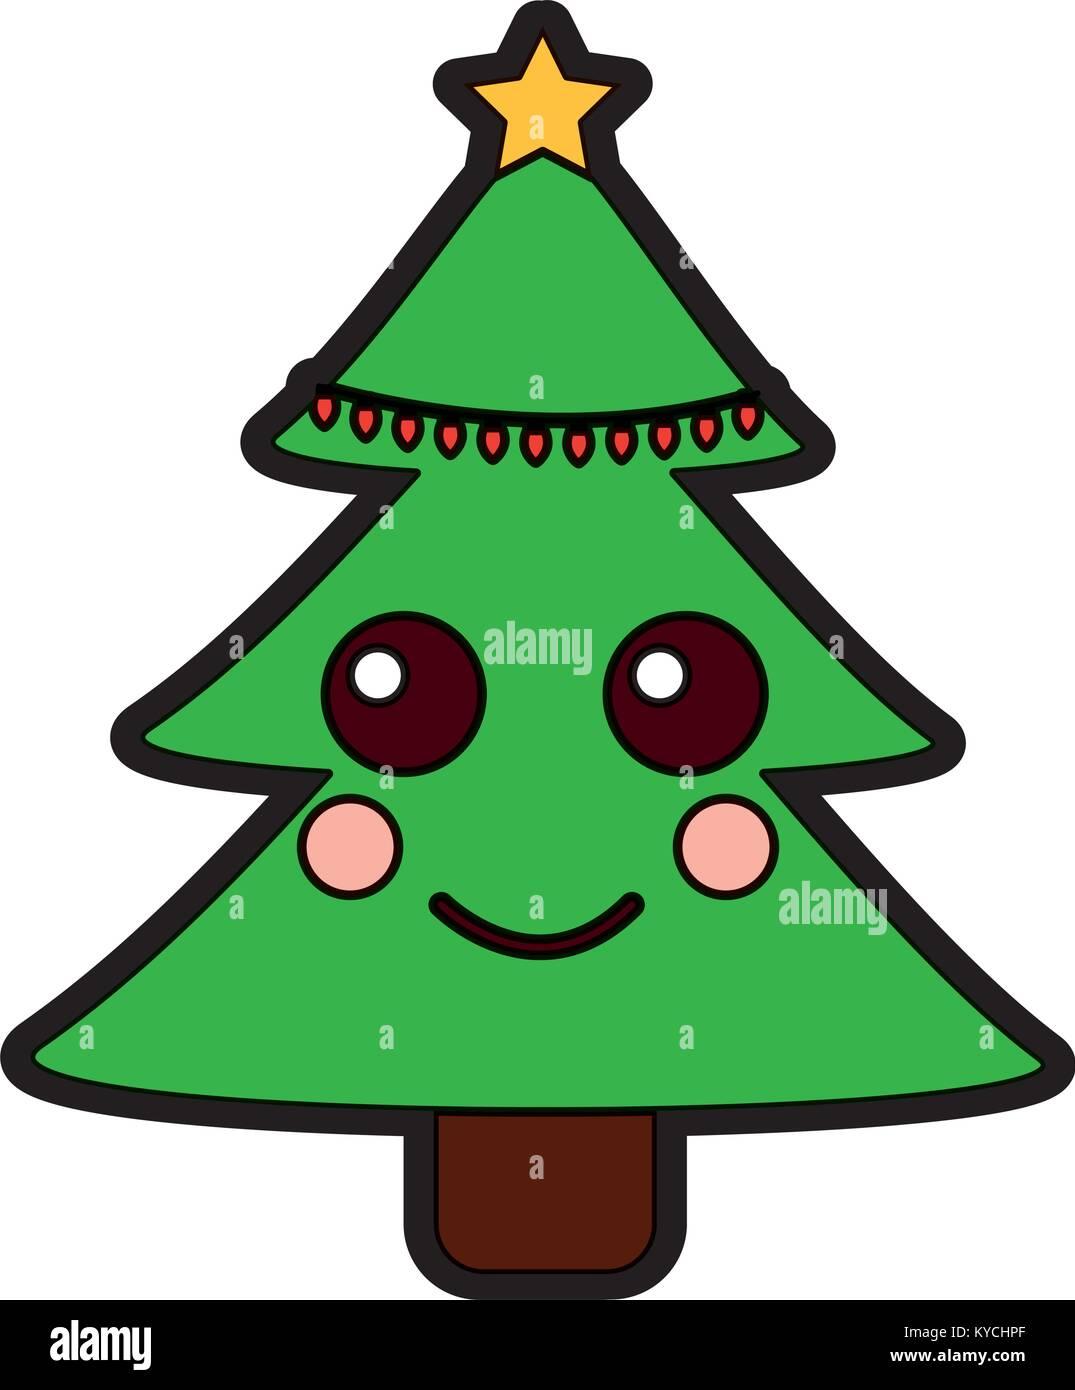 Cartoon Christmas Tree.Christmas Tree Kawaii Cartoon Smiling Stock Vector Art